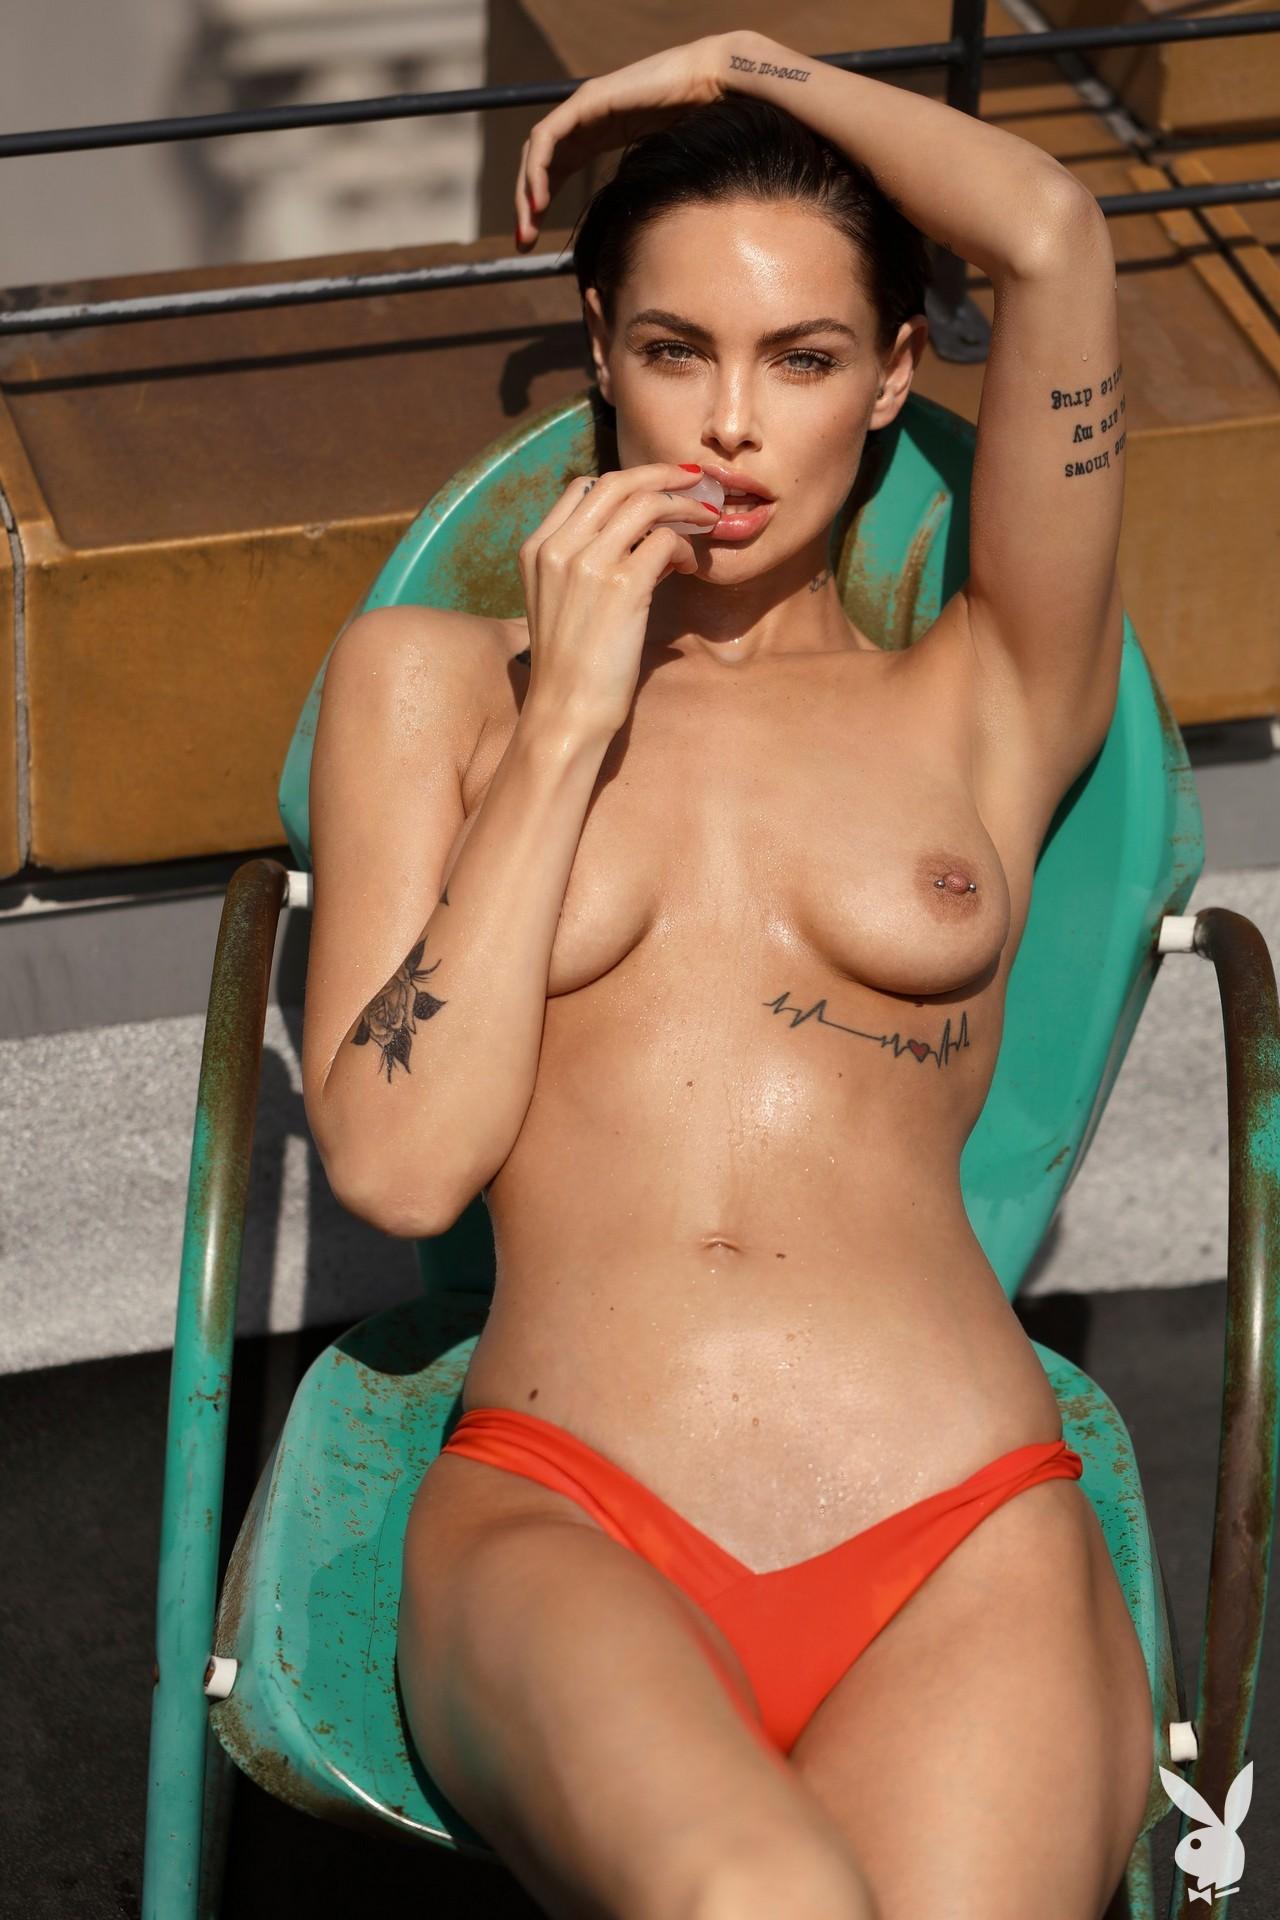 Playmate July 2019 Teela Laroux Playboy Plus (42)